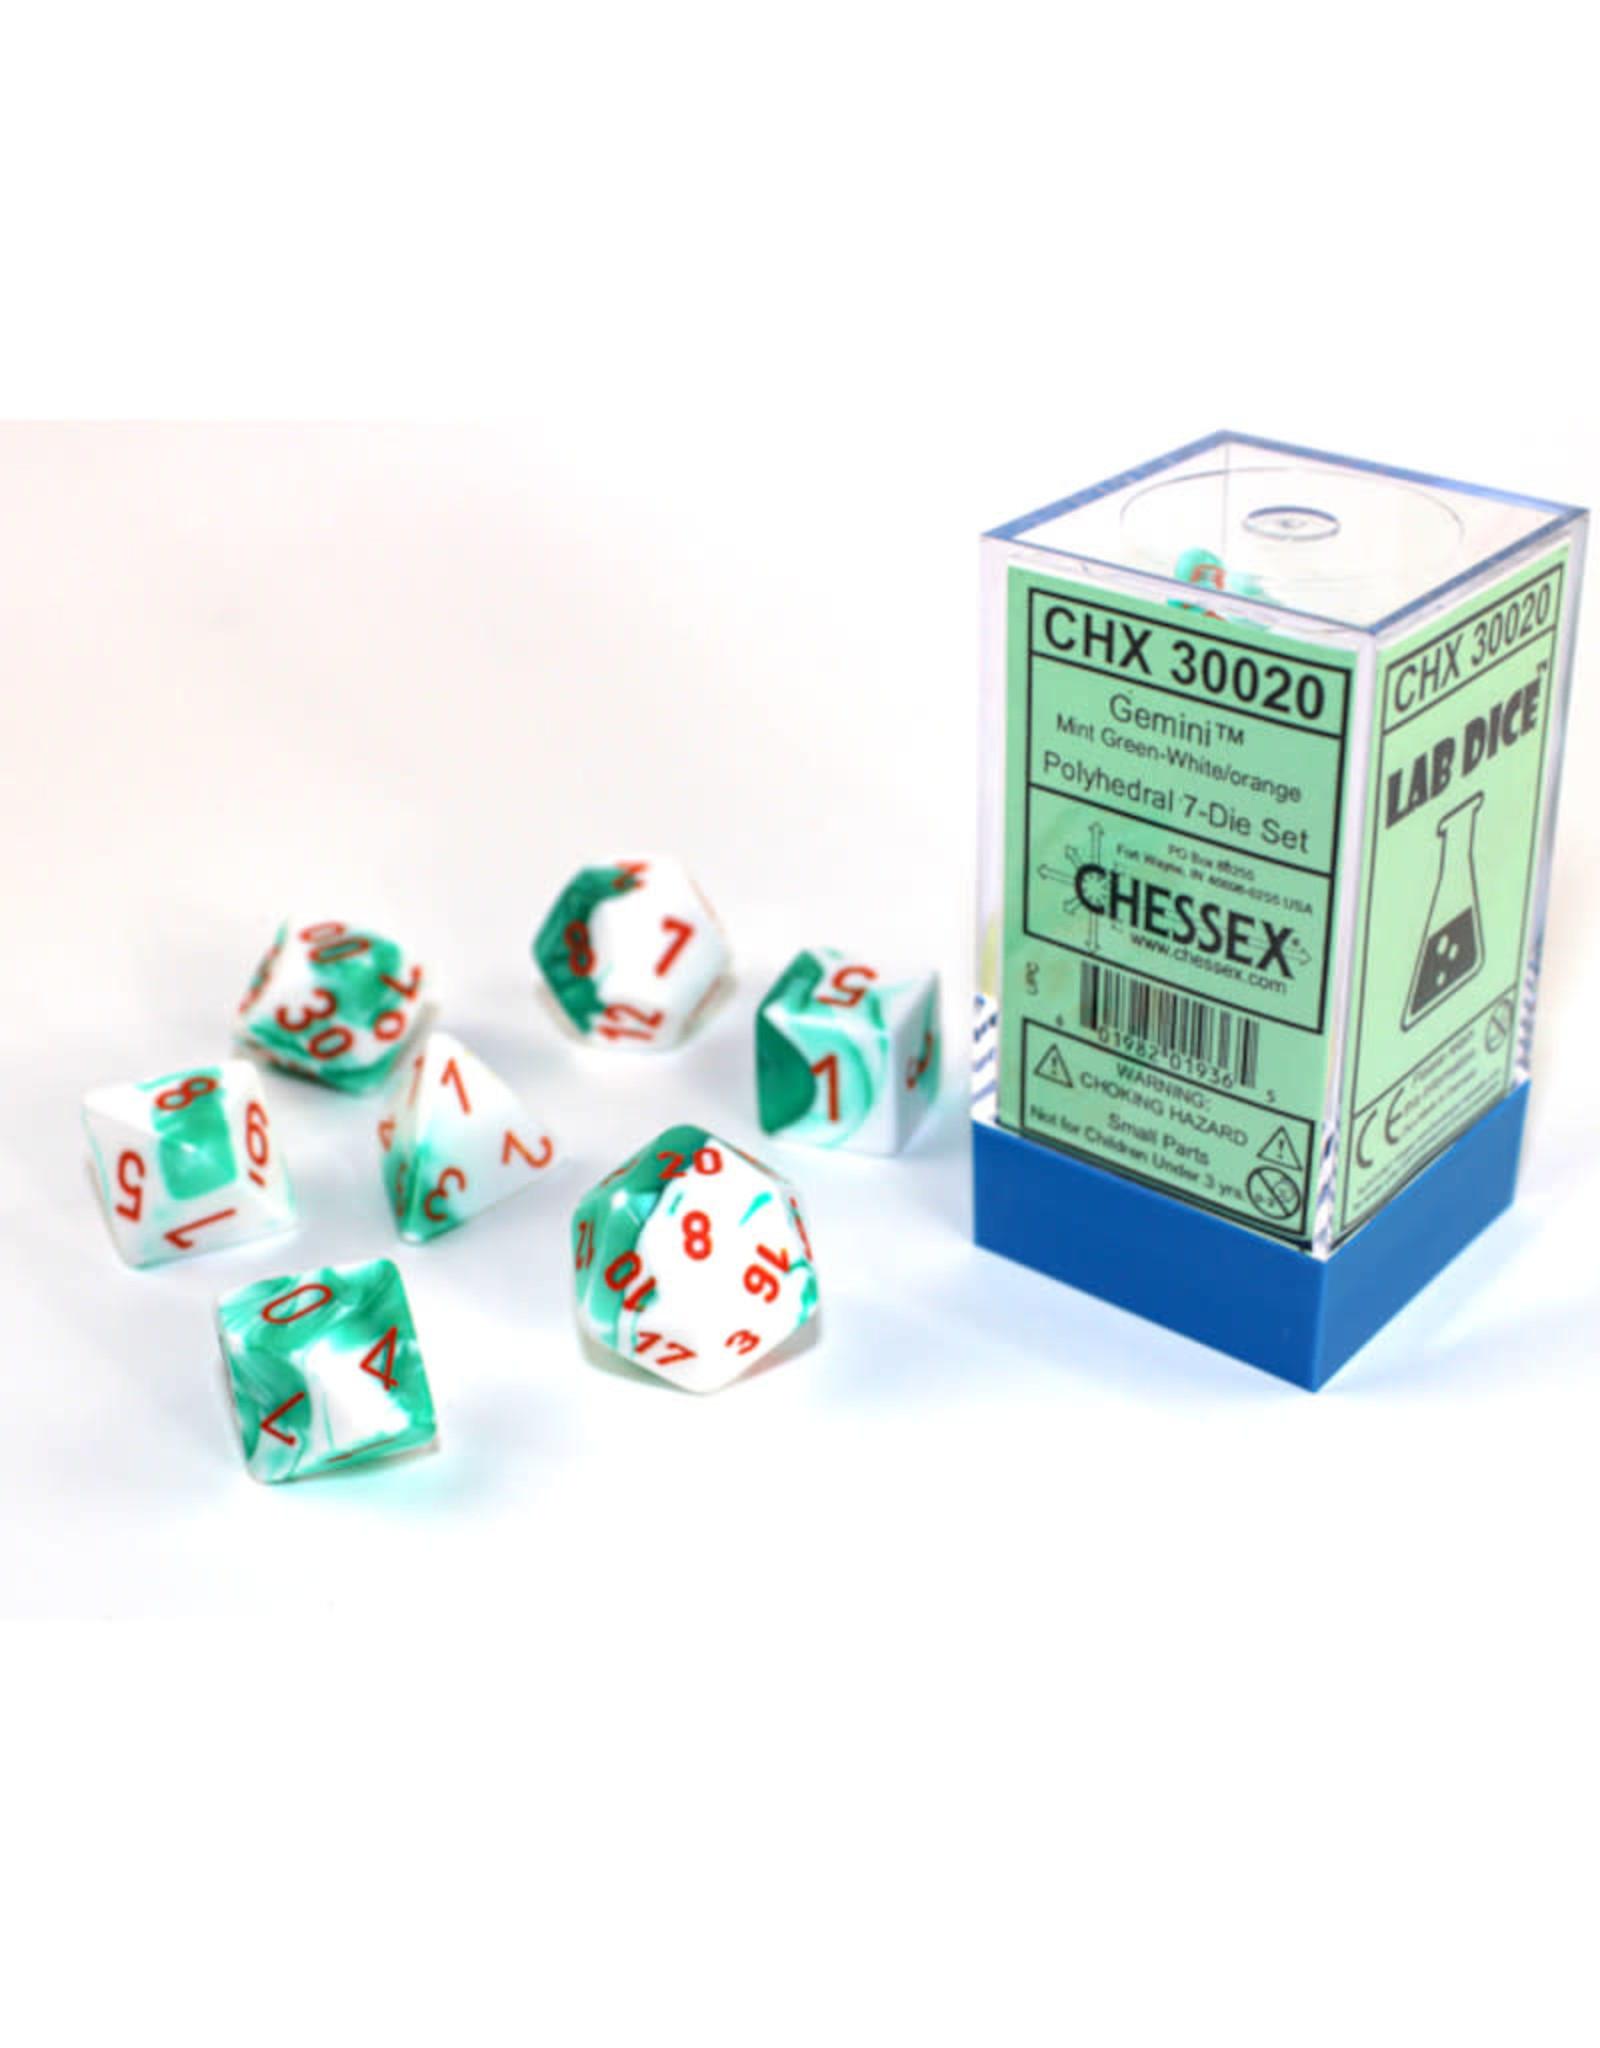 Chessex Polyhedral Lab Dice: Mint Green/White/Orange (7)